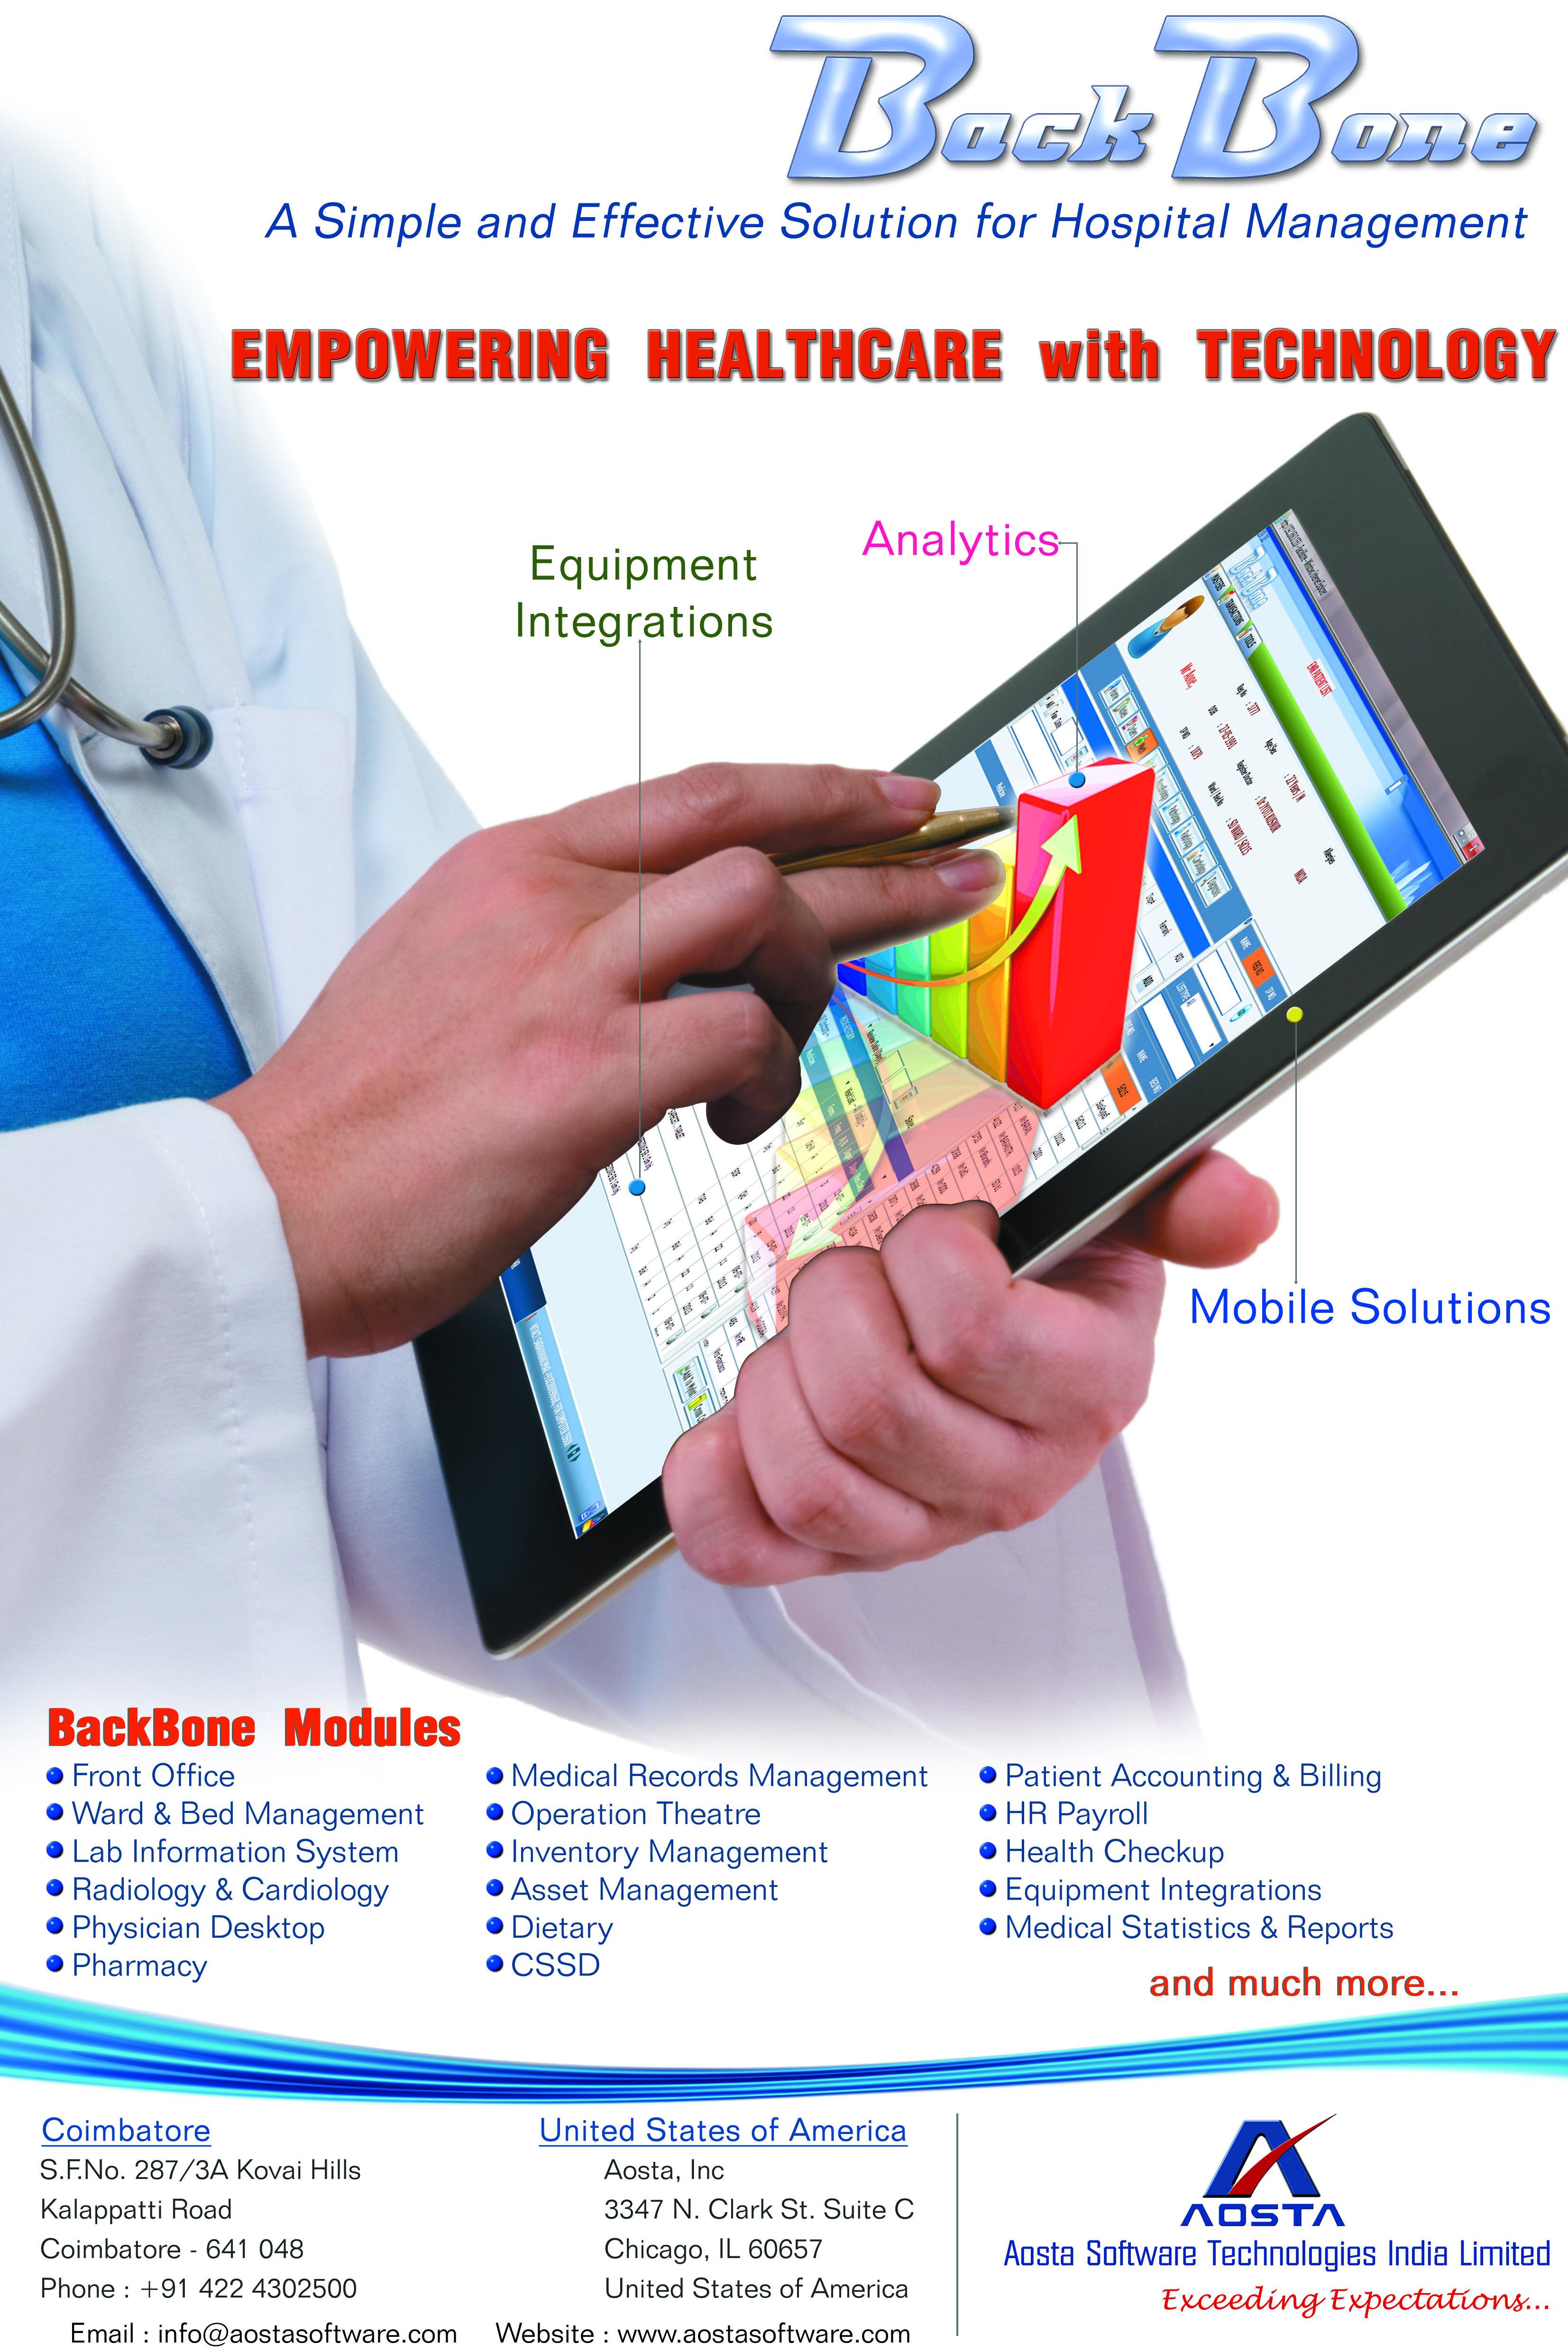 Tamil Nadu Health Systems Project